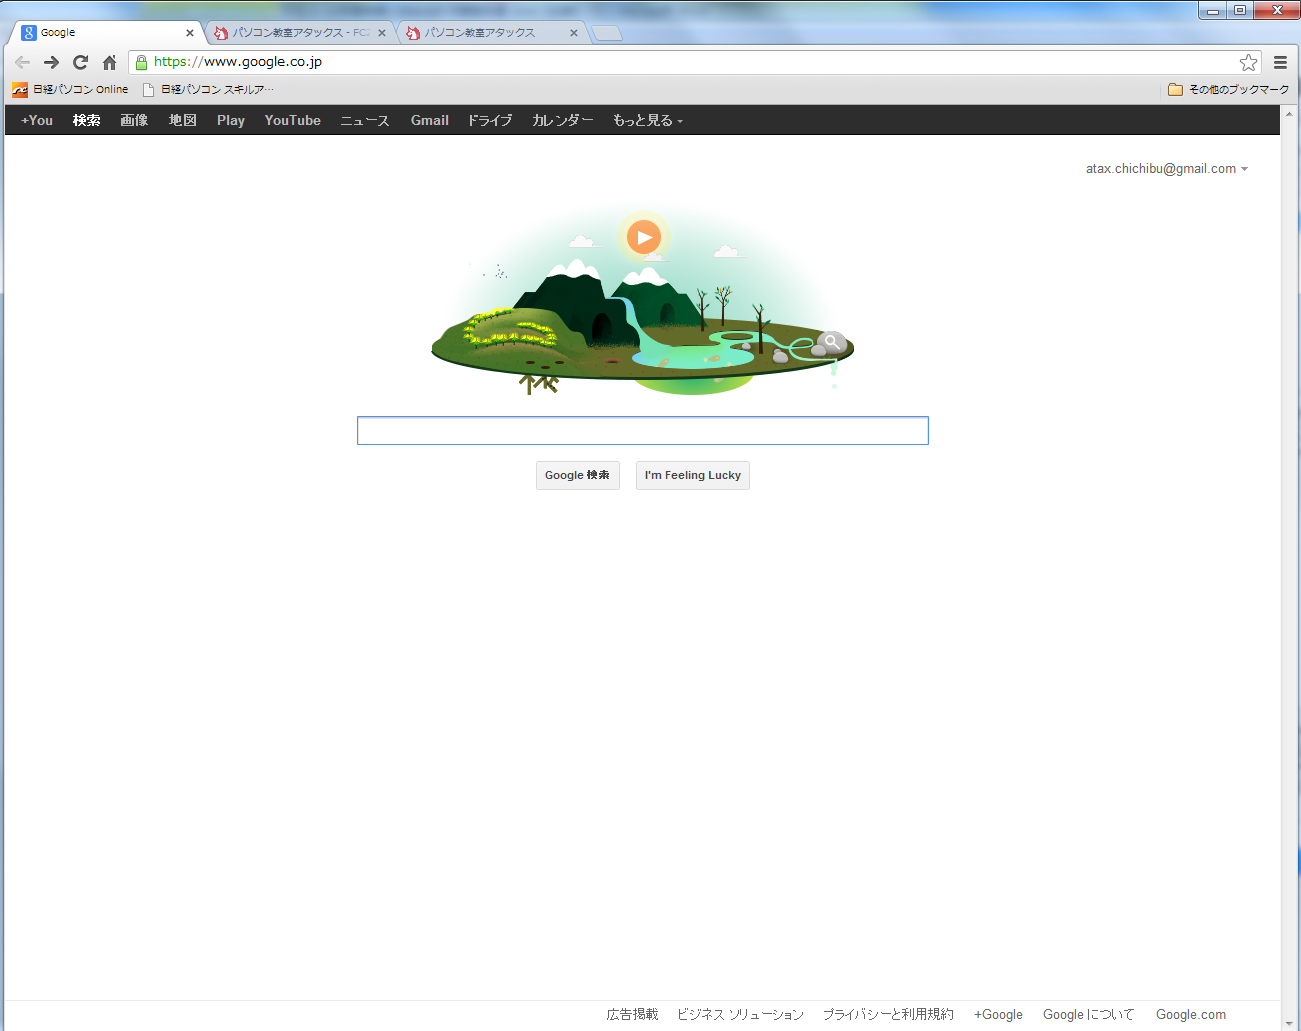 ataxgoogle6.jpg